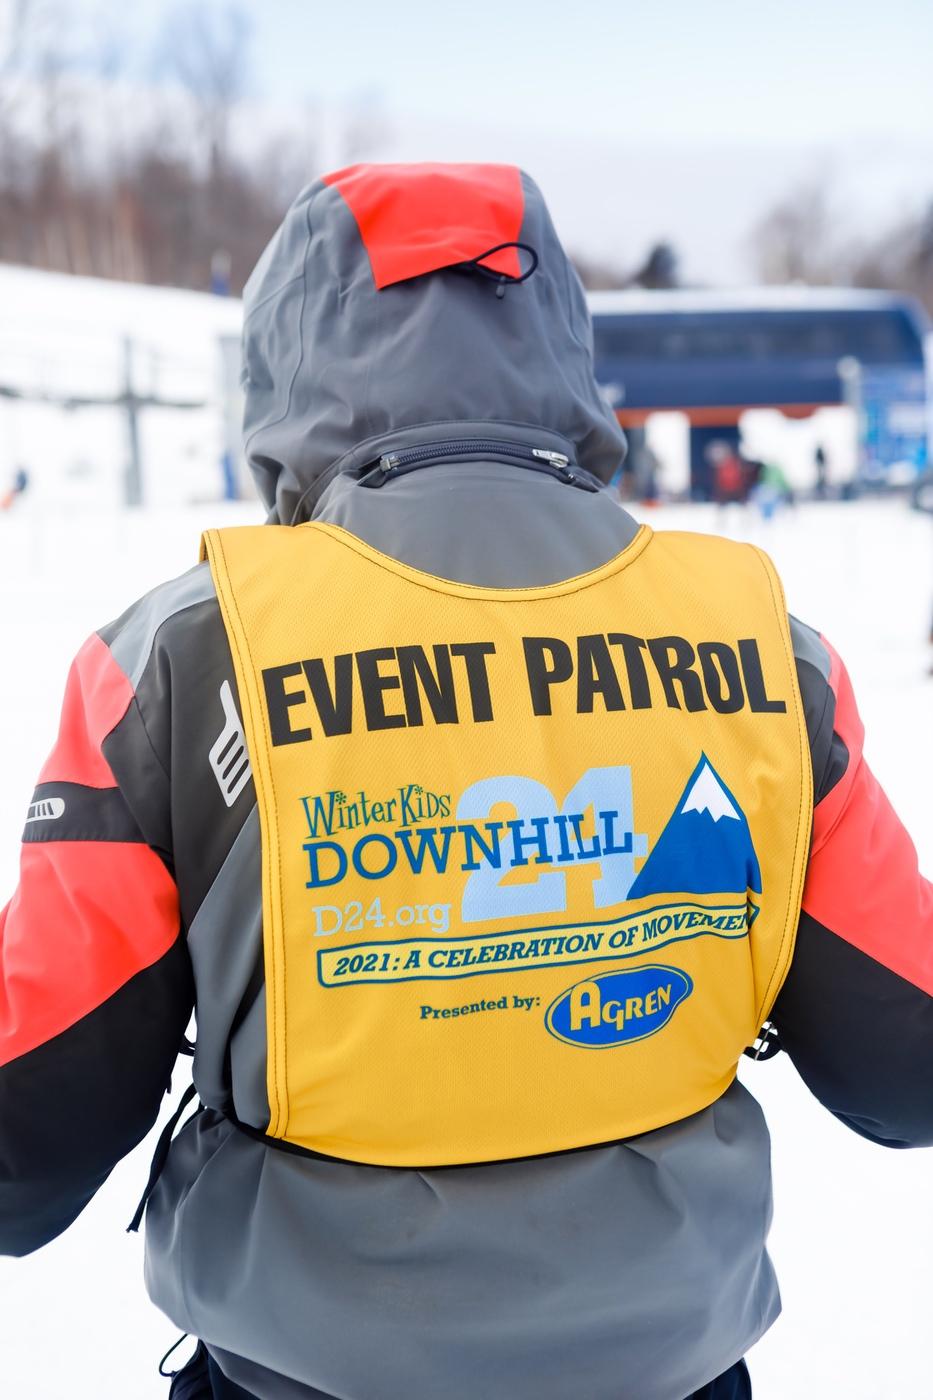 WinterKids Downhill 24 2021 SDP 2933